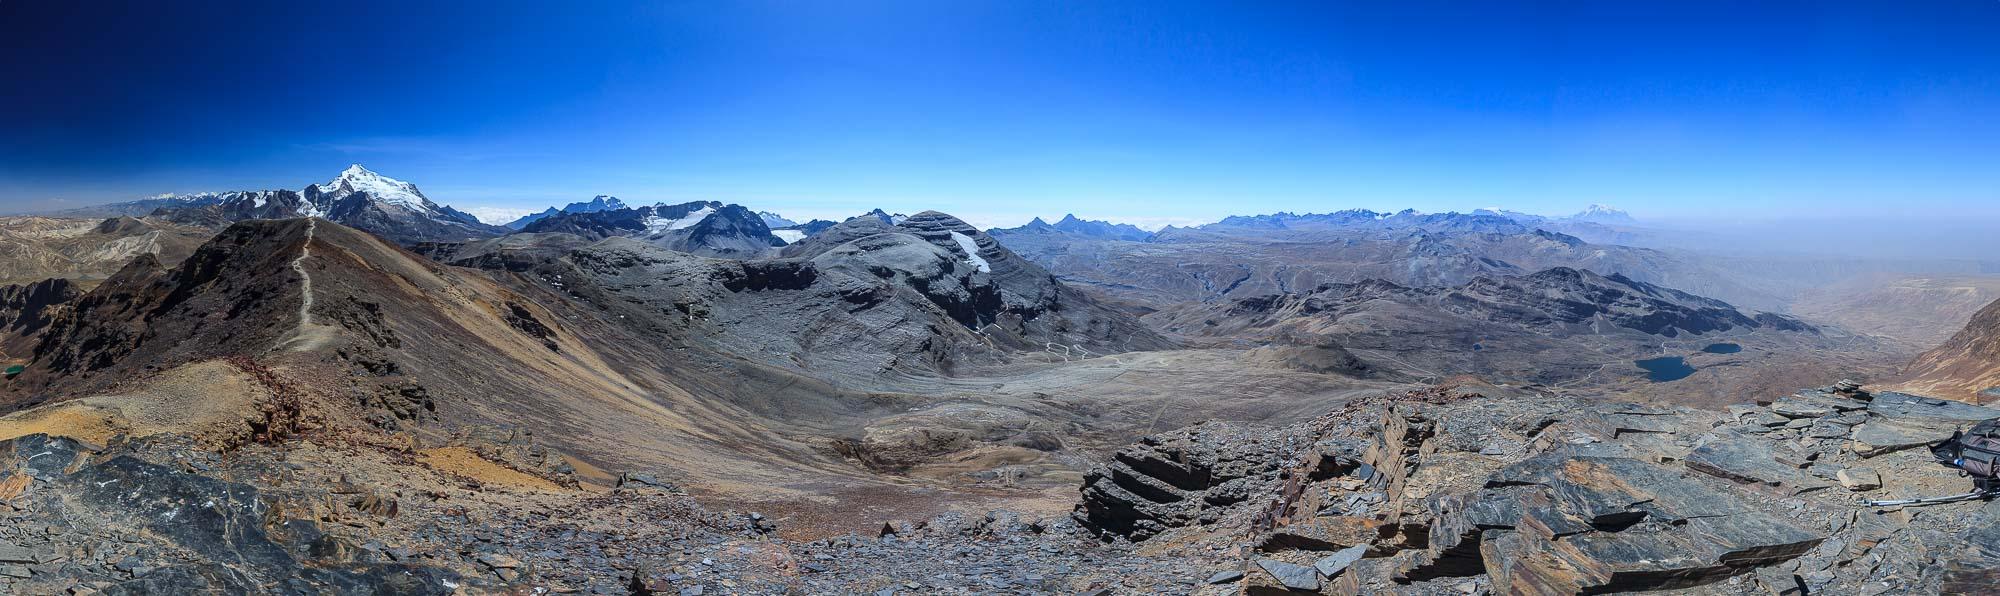 the world's highest ski resort - chacaltaya 5486m - bolivia